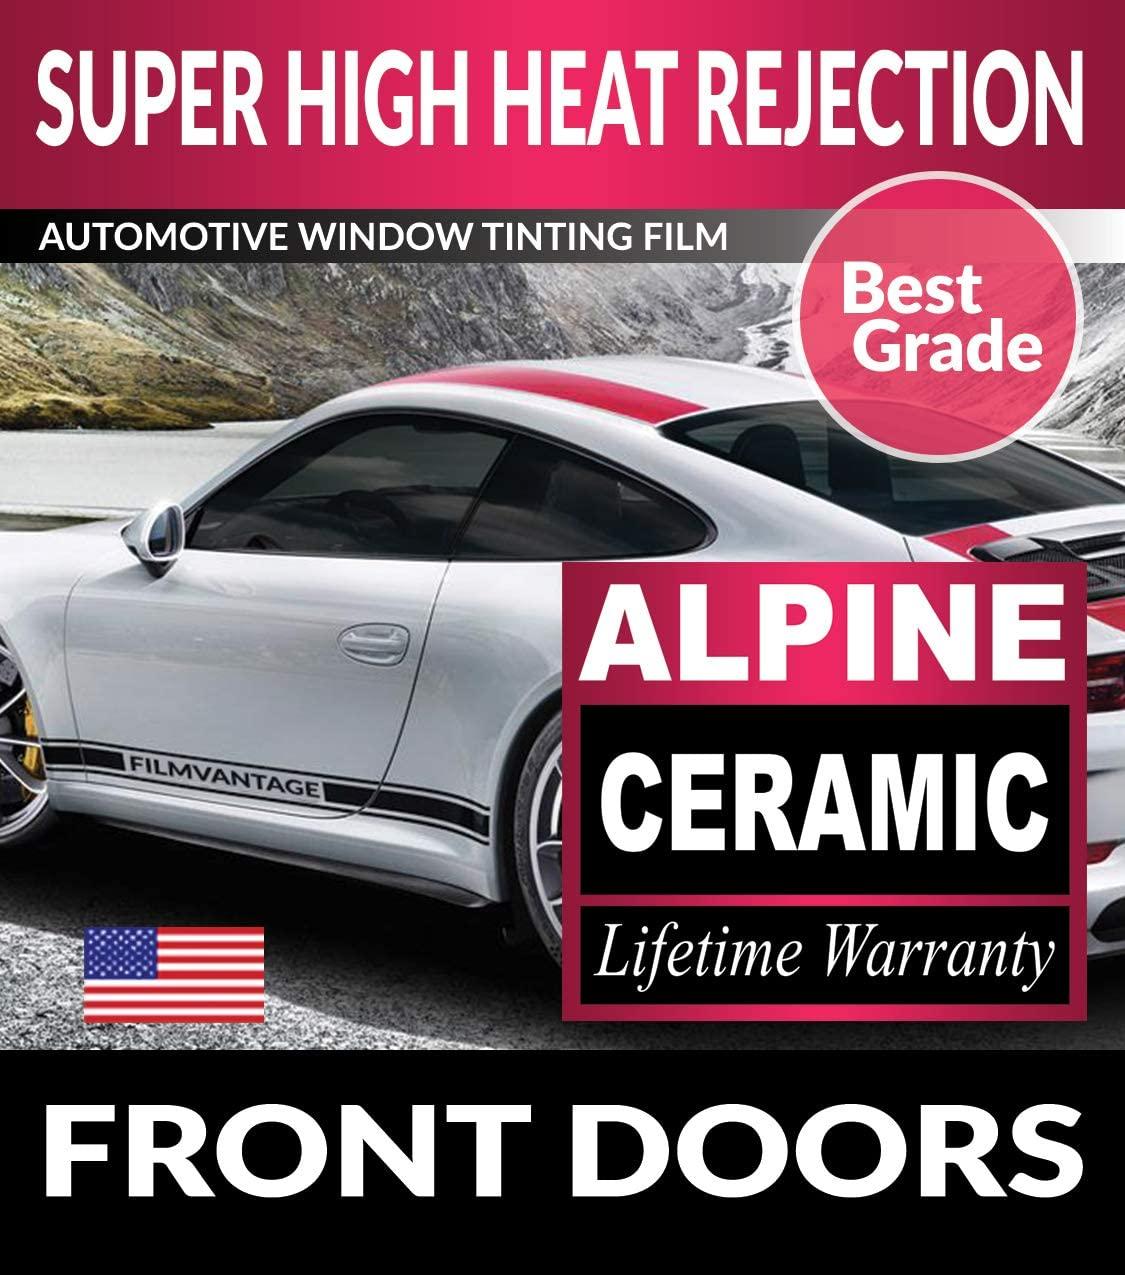 Super High Heat Rejection Alpine Precut Front Doors Tint for Gmc Sierra 1500 Double 2014 2015 2016 2017 2018 - F5%